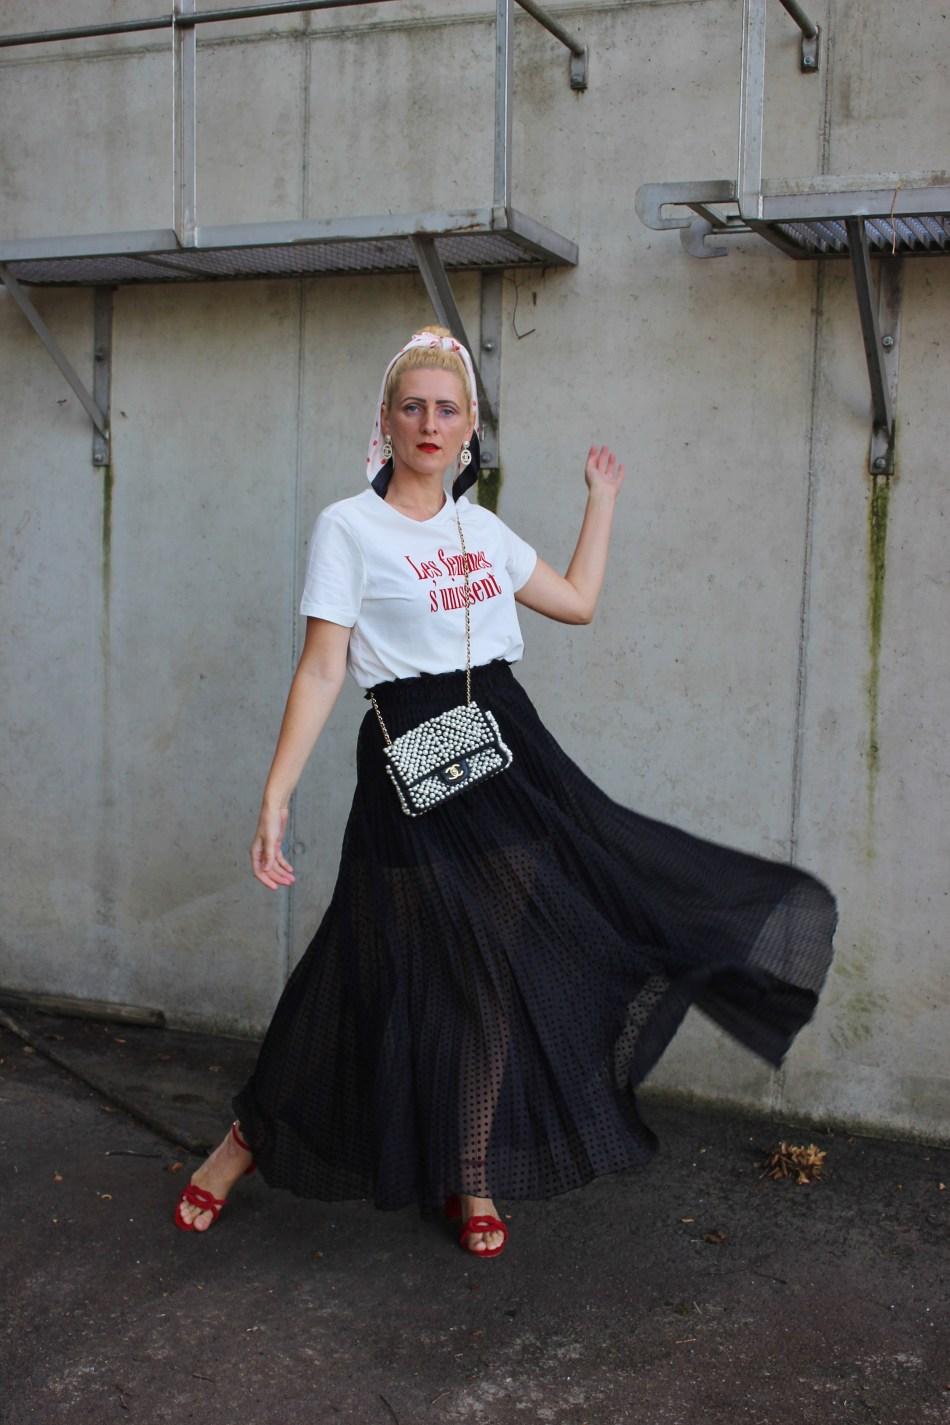 Valentino-Transparenter Rock-Transparenz-Chanel Perlentasche-Sandalen Rot Samt Gino Rossi-CCC Shoes and Bags-CCC Ambassador-Bloggerstyle-carrieslifestyle-Tamara Prutsch